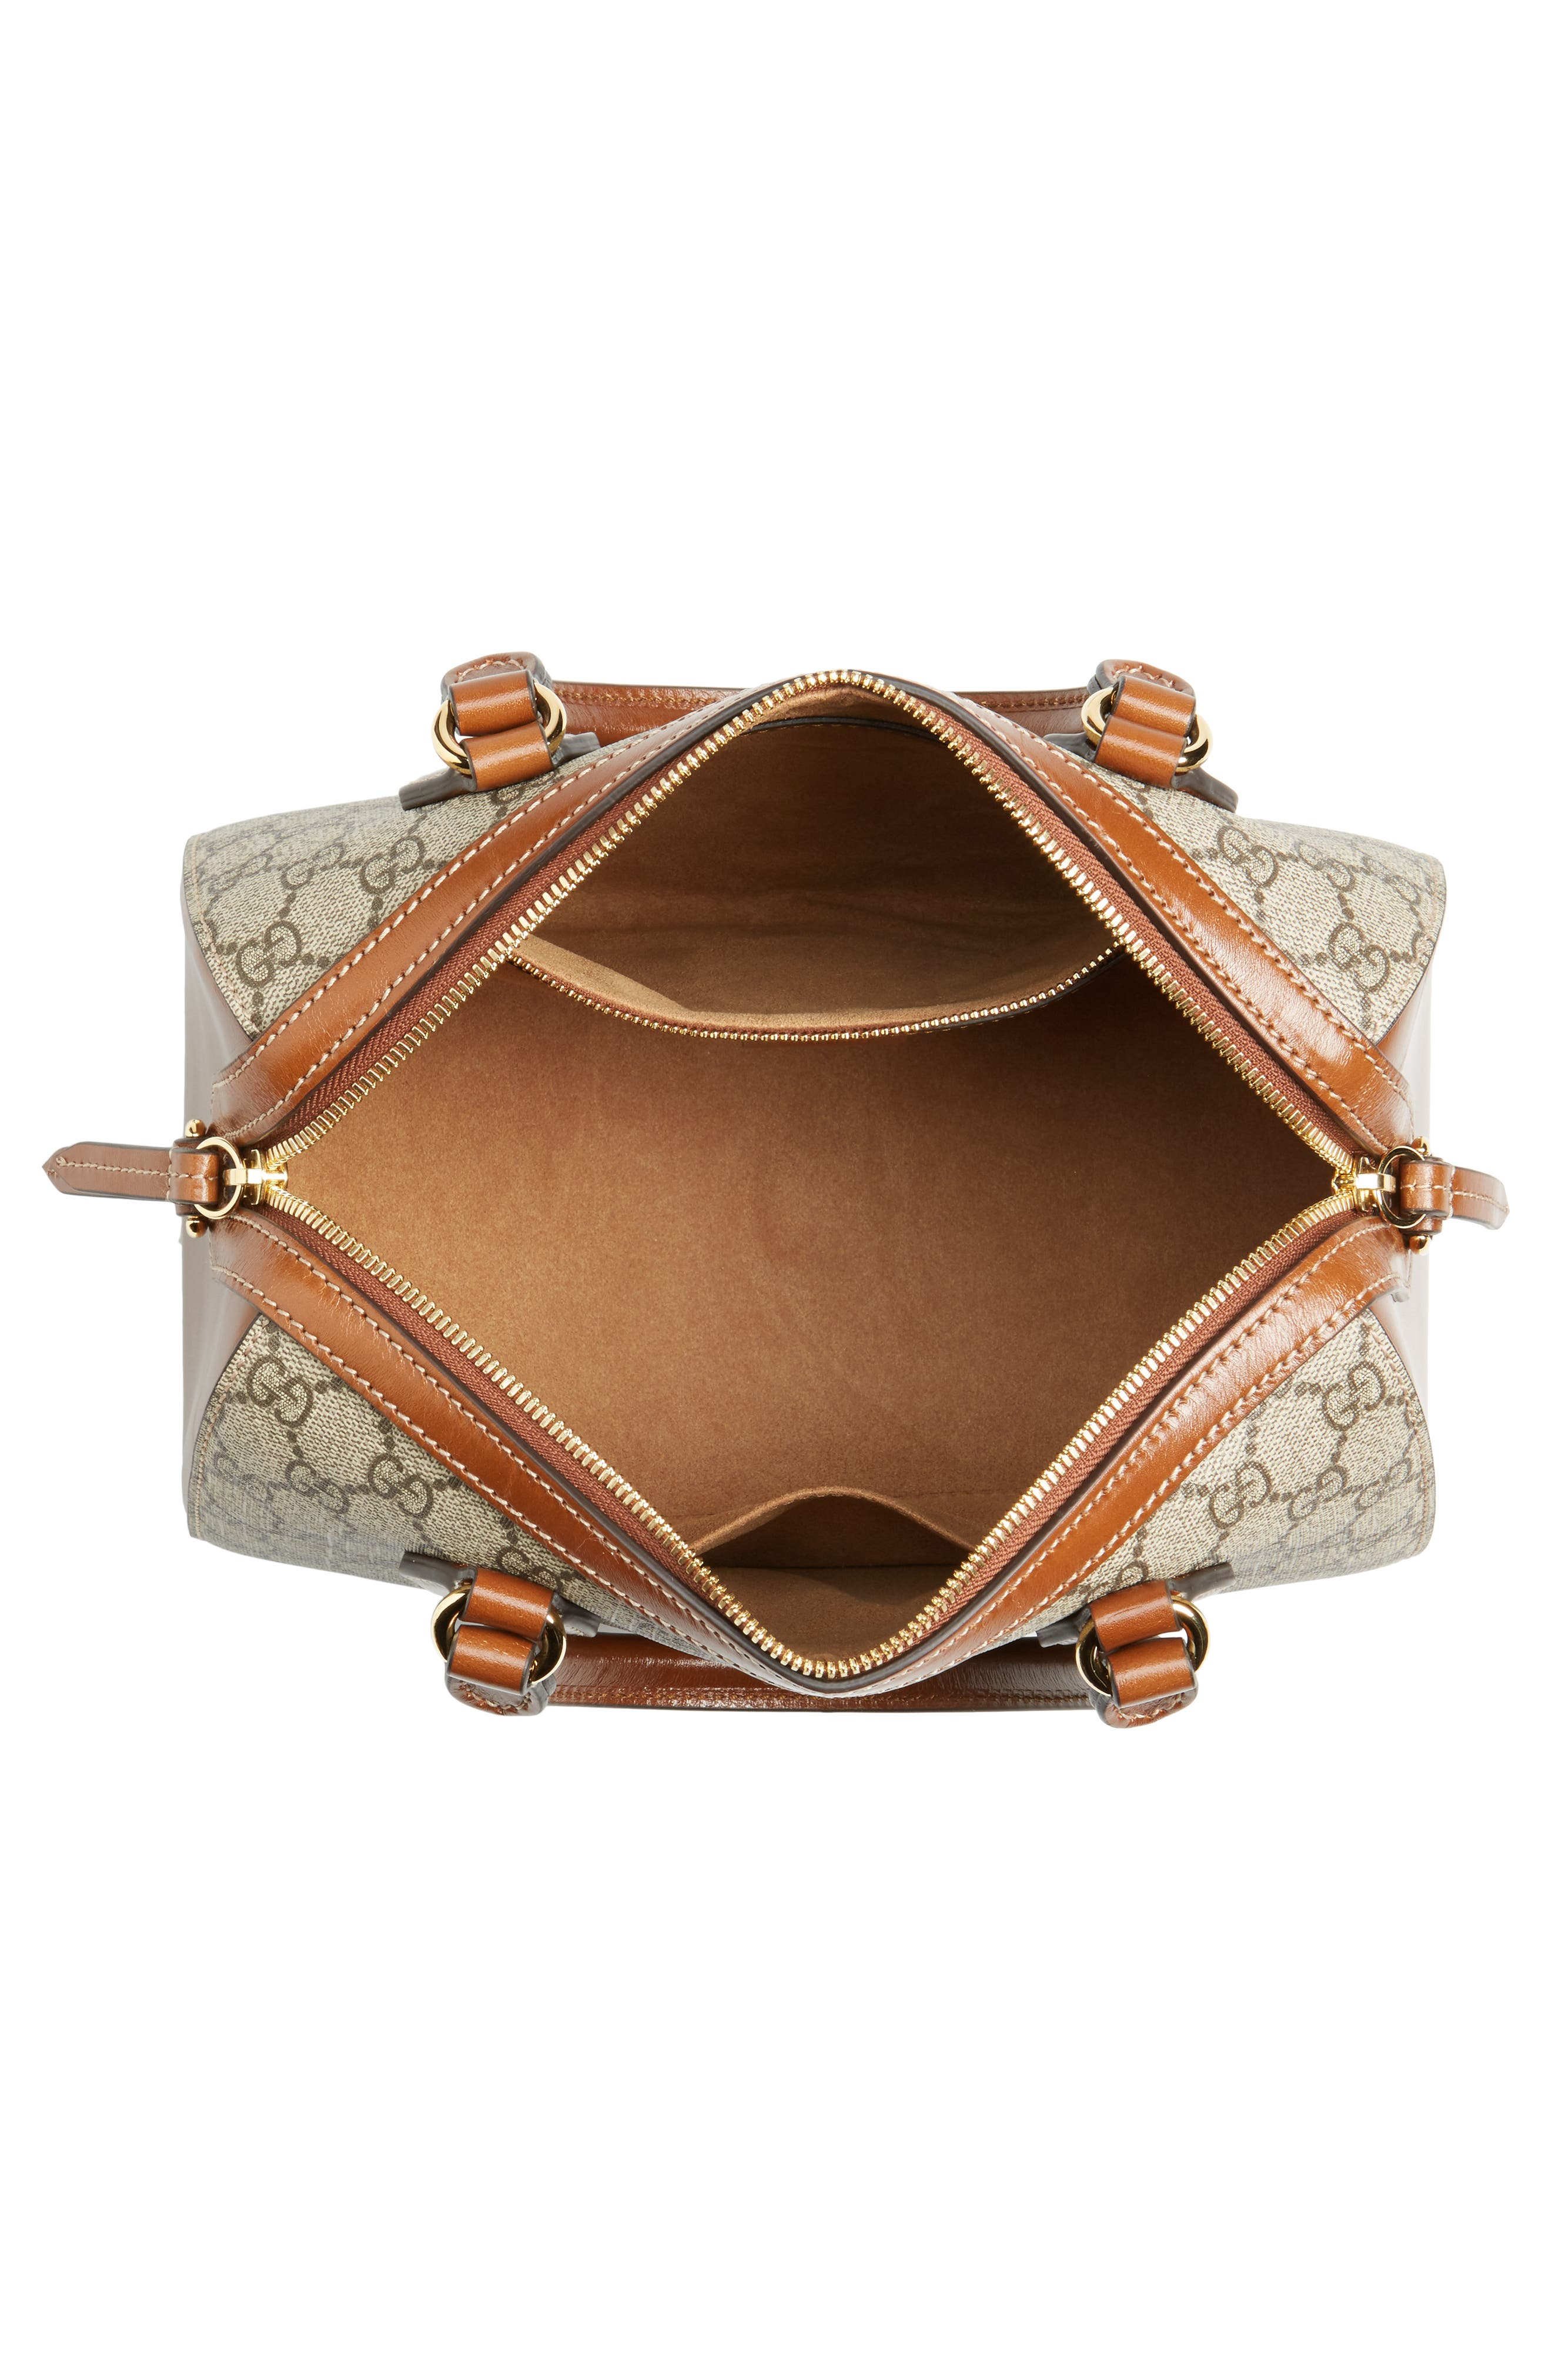 Linea Top Handle GG Supreme Canvas & Leather Bag,                             Alternate thumbnail 4, color,                             Beige/ Ebony/ Cuir